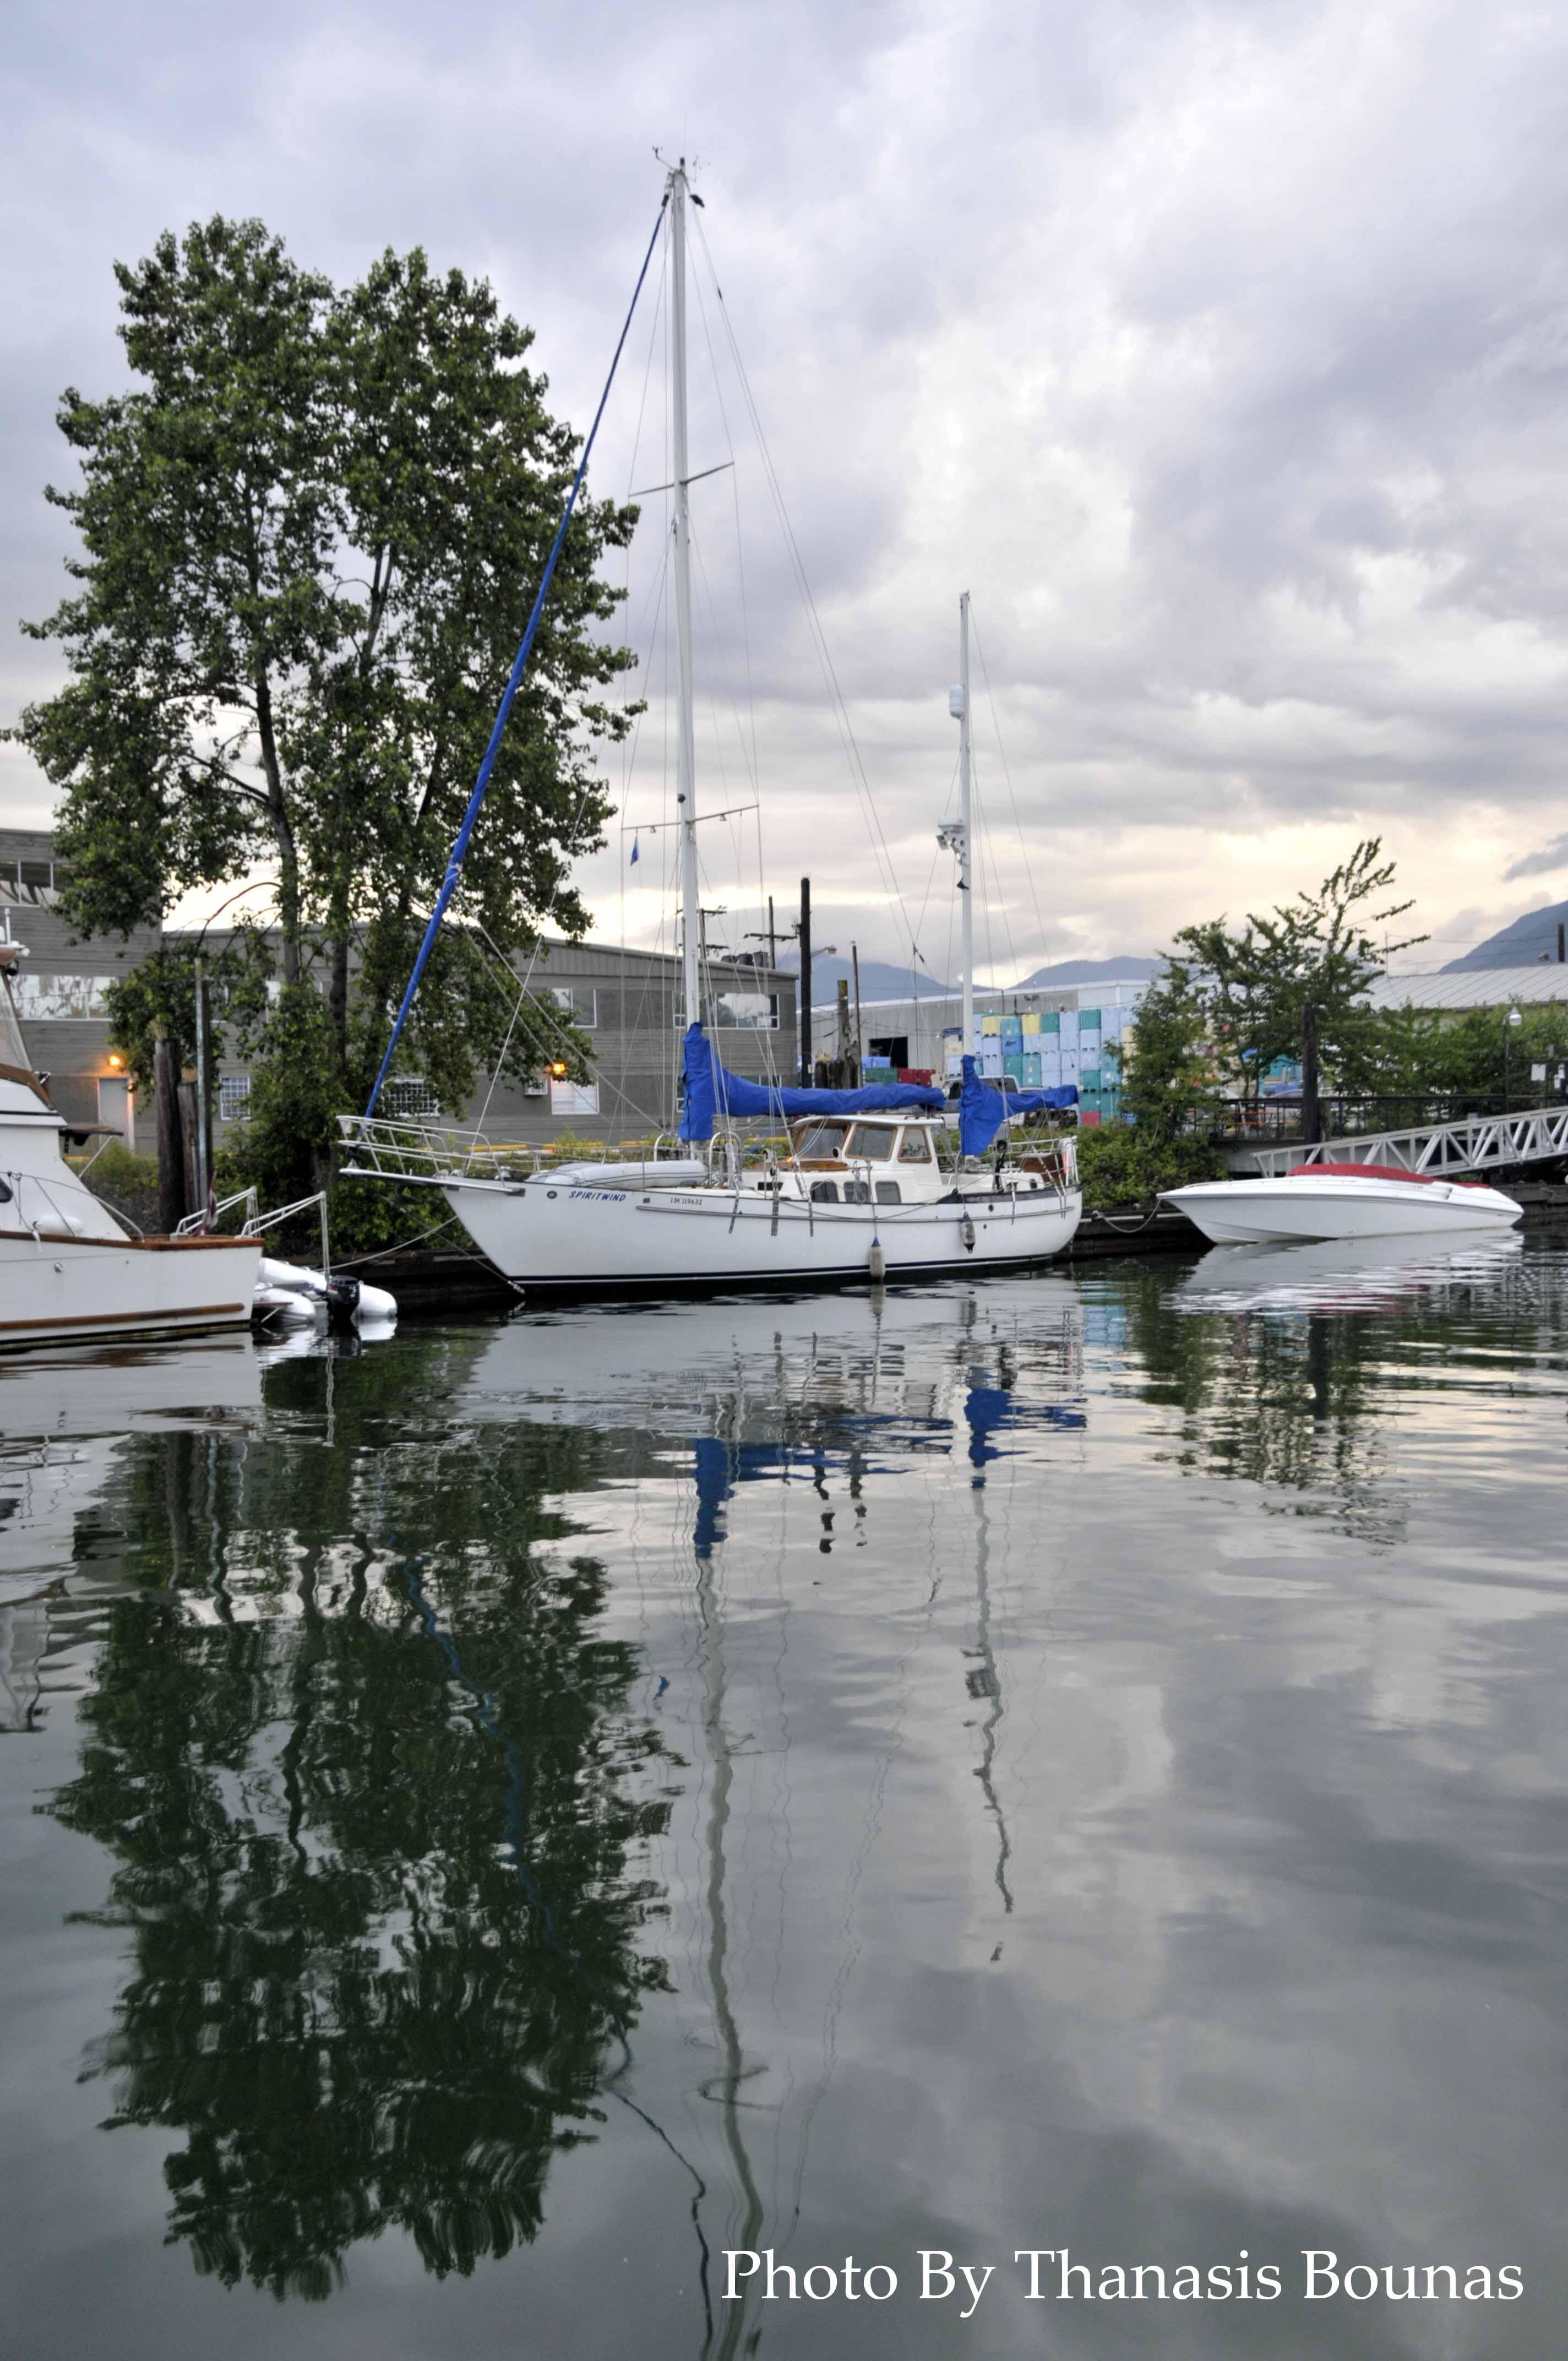 43 North Vancouver Beautiful British Columbia Photo By Thanasis Bounas